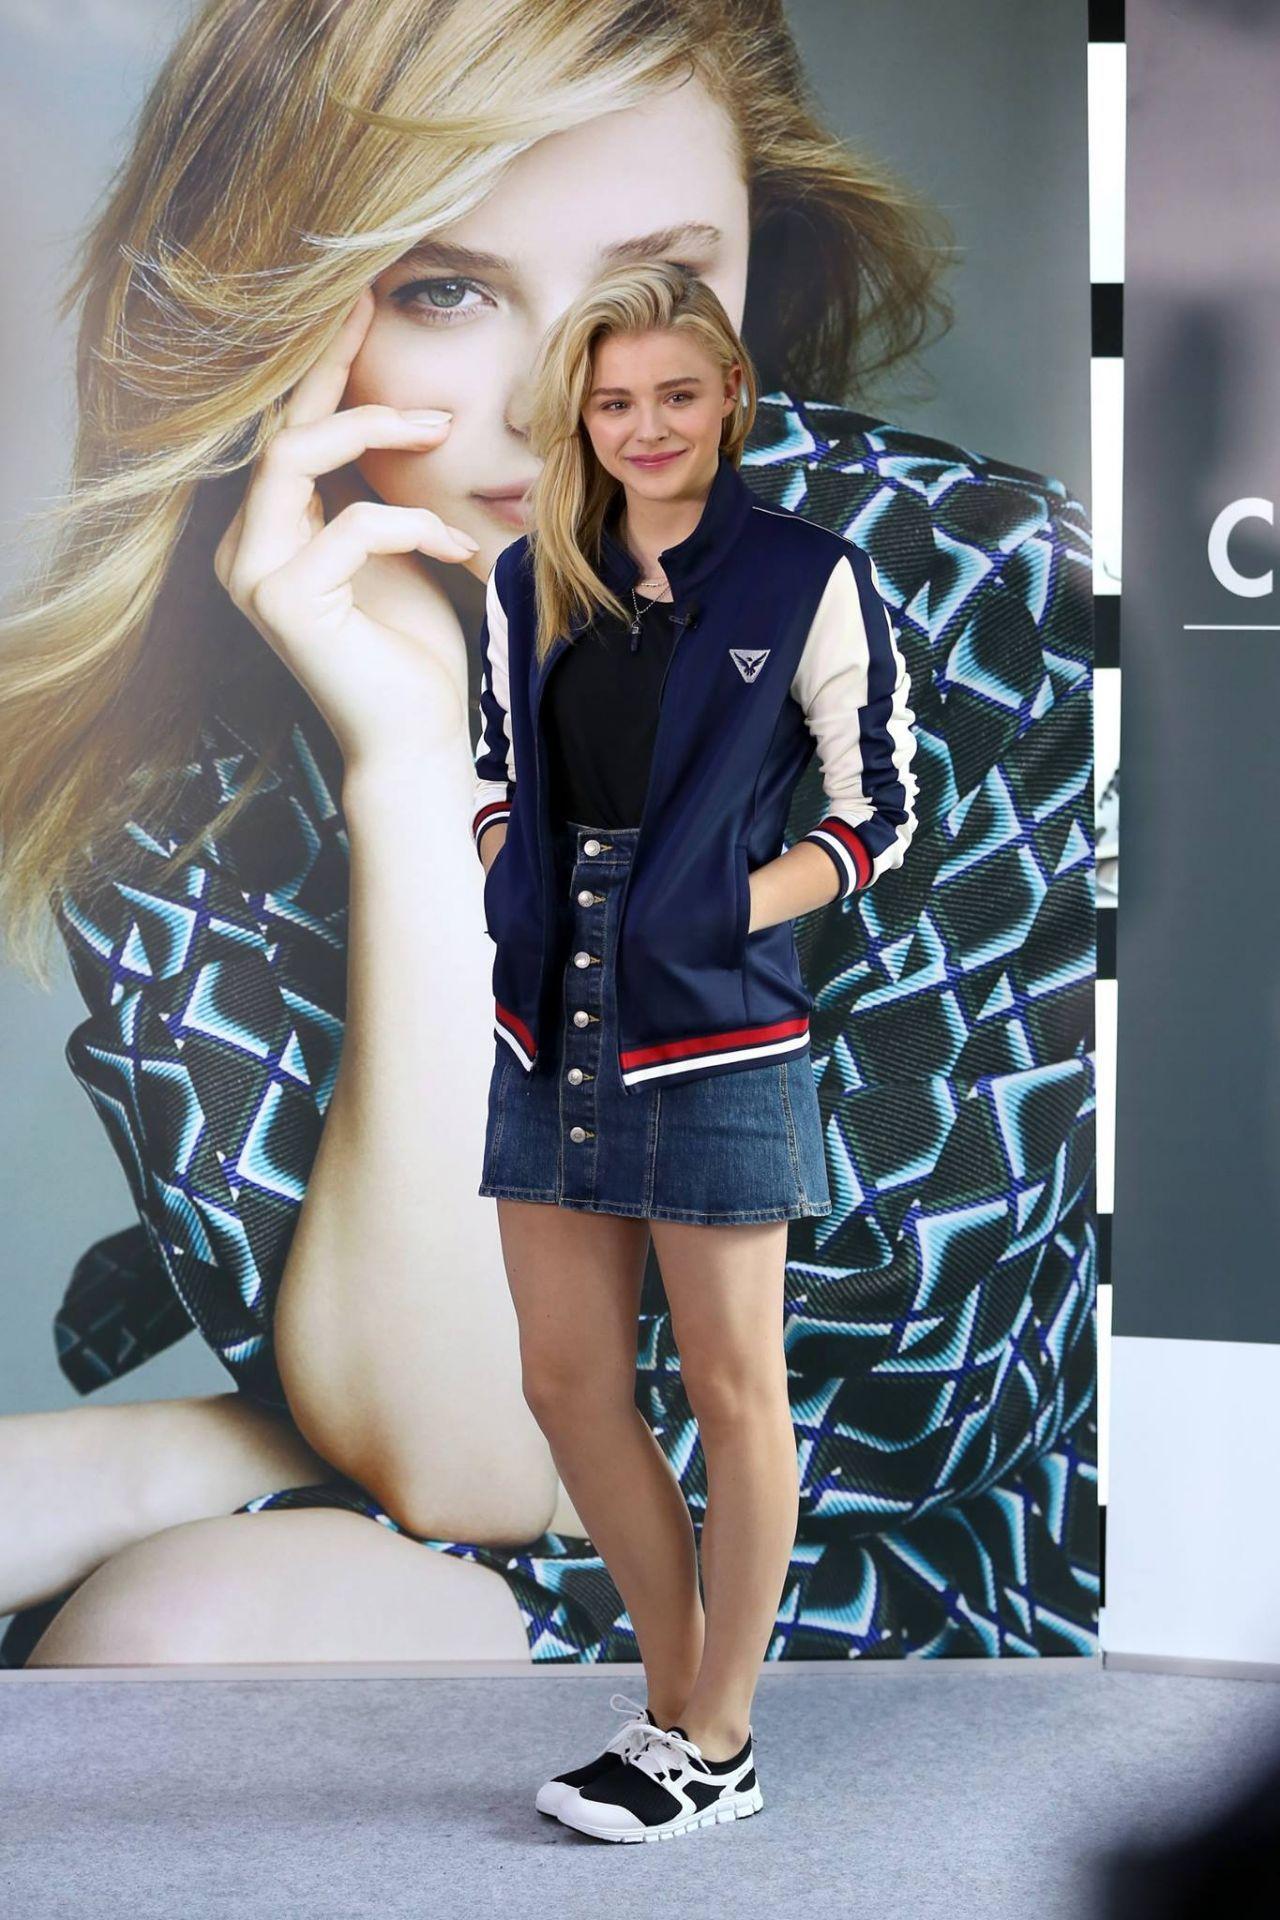 chloe single girls Add tags to refine results #showing #vibrator #pussy #tight #cassie #masturbation #teen #chloe-foster #single-girl #brunette #models #anal #legs #ftv #wants #babe #fun #lesbian #blonde.